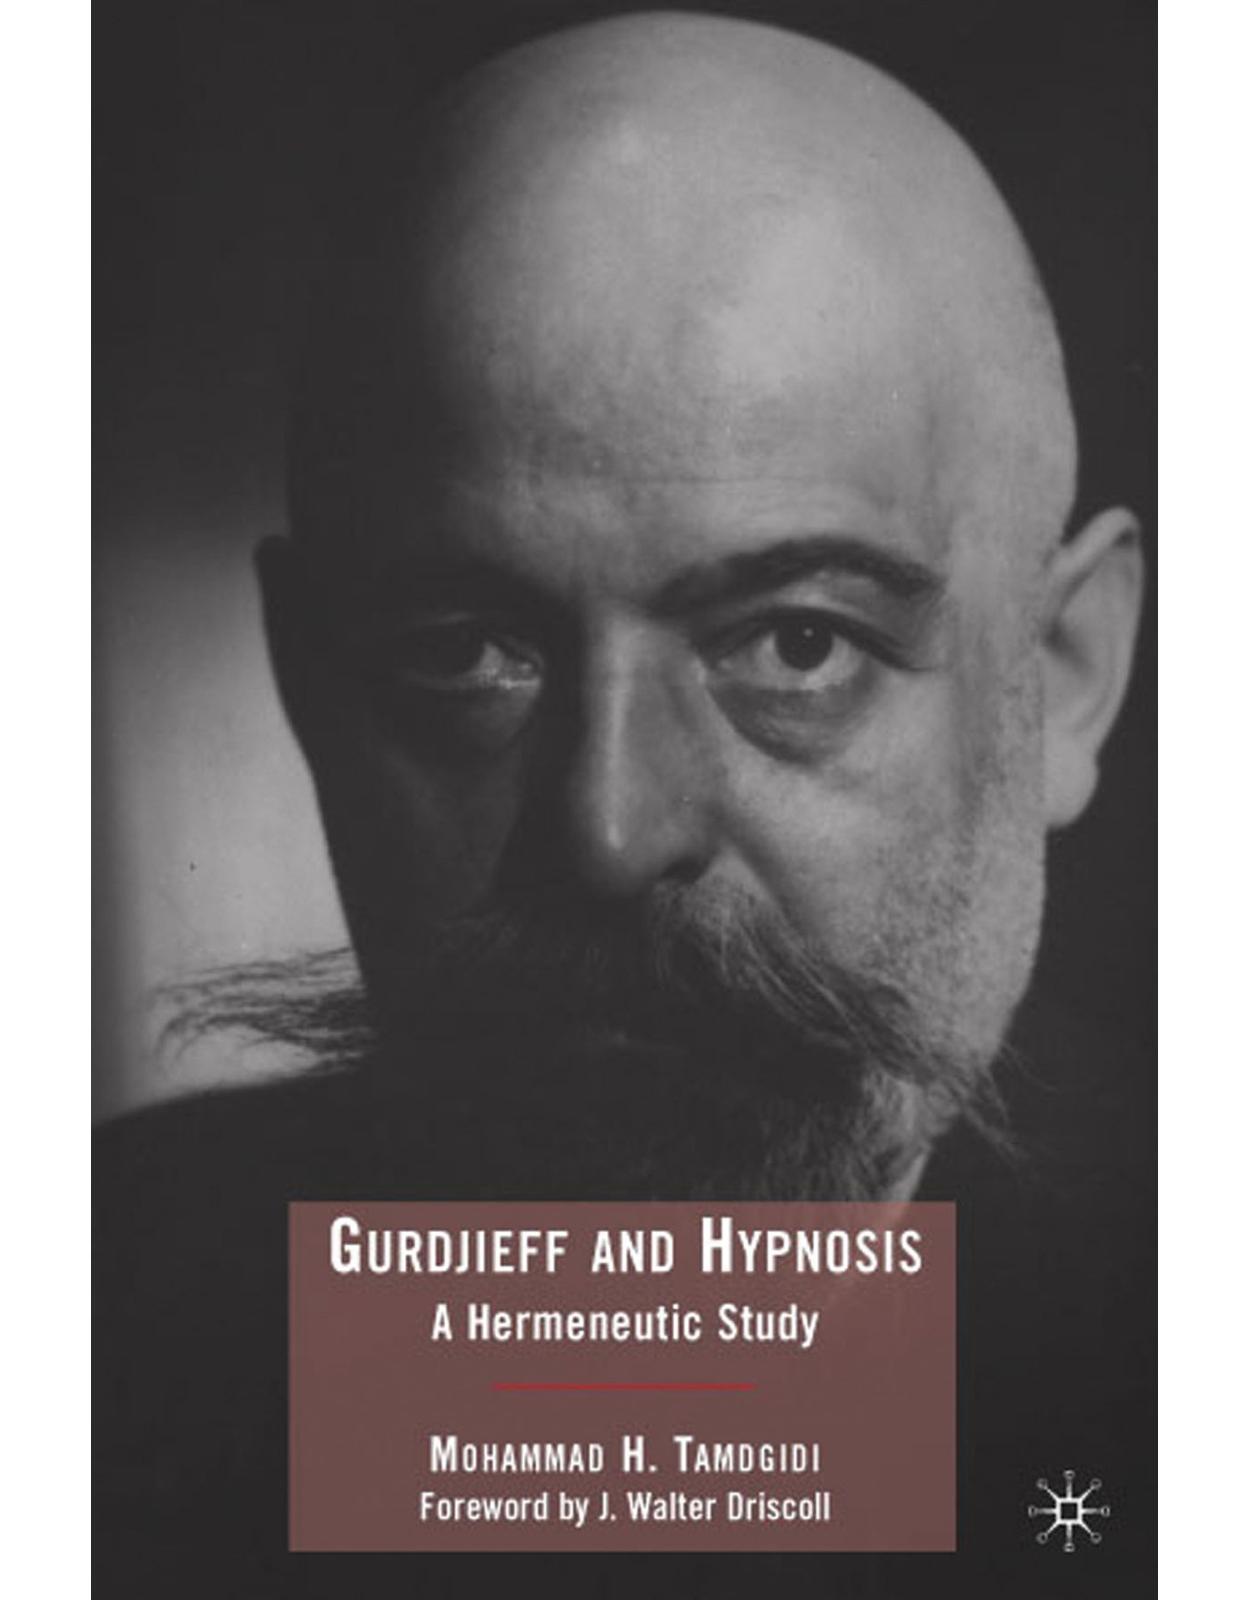 Gurdjieff and Hypnosis: A Hermeneutic Study